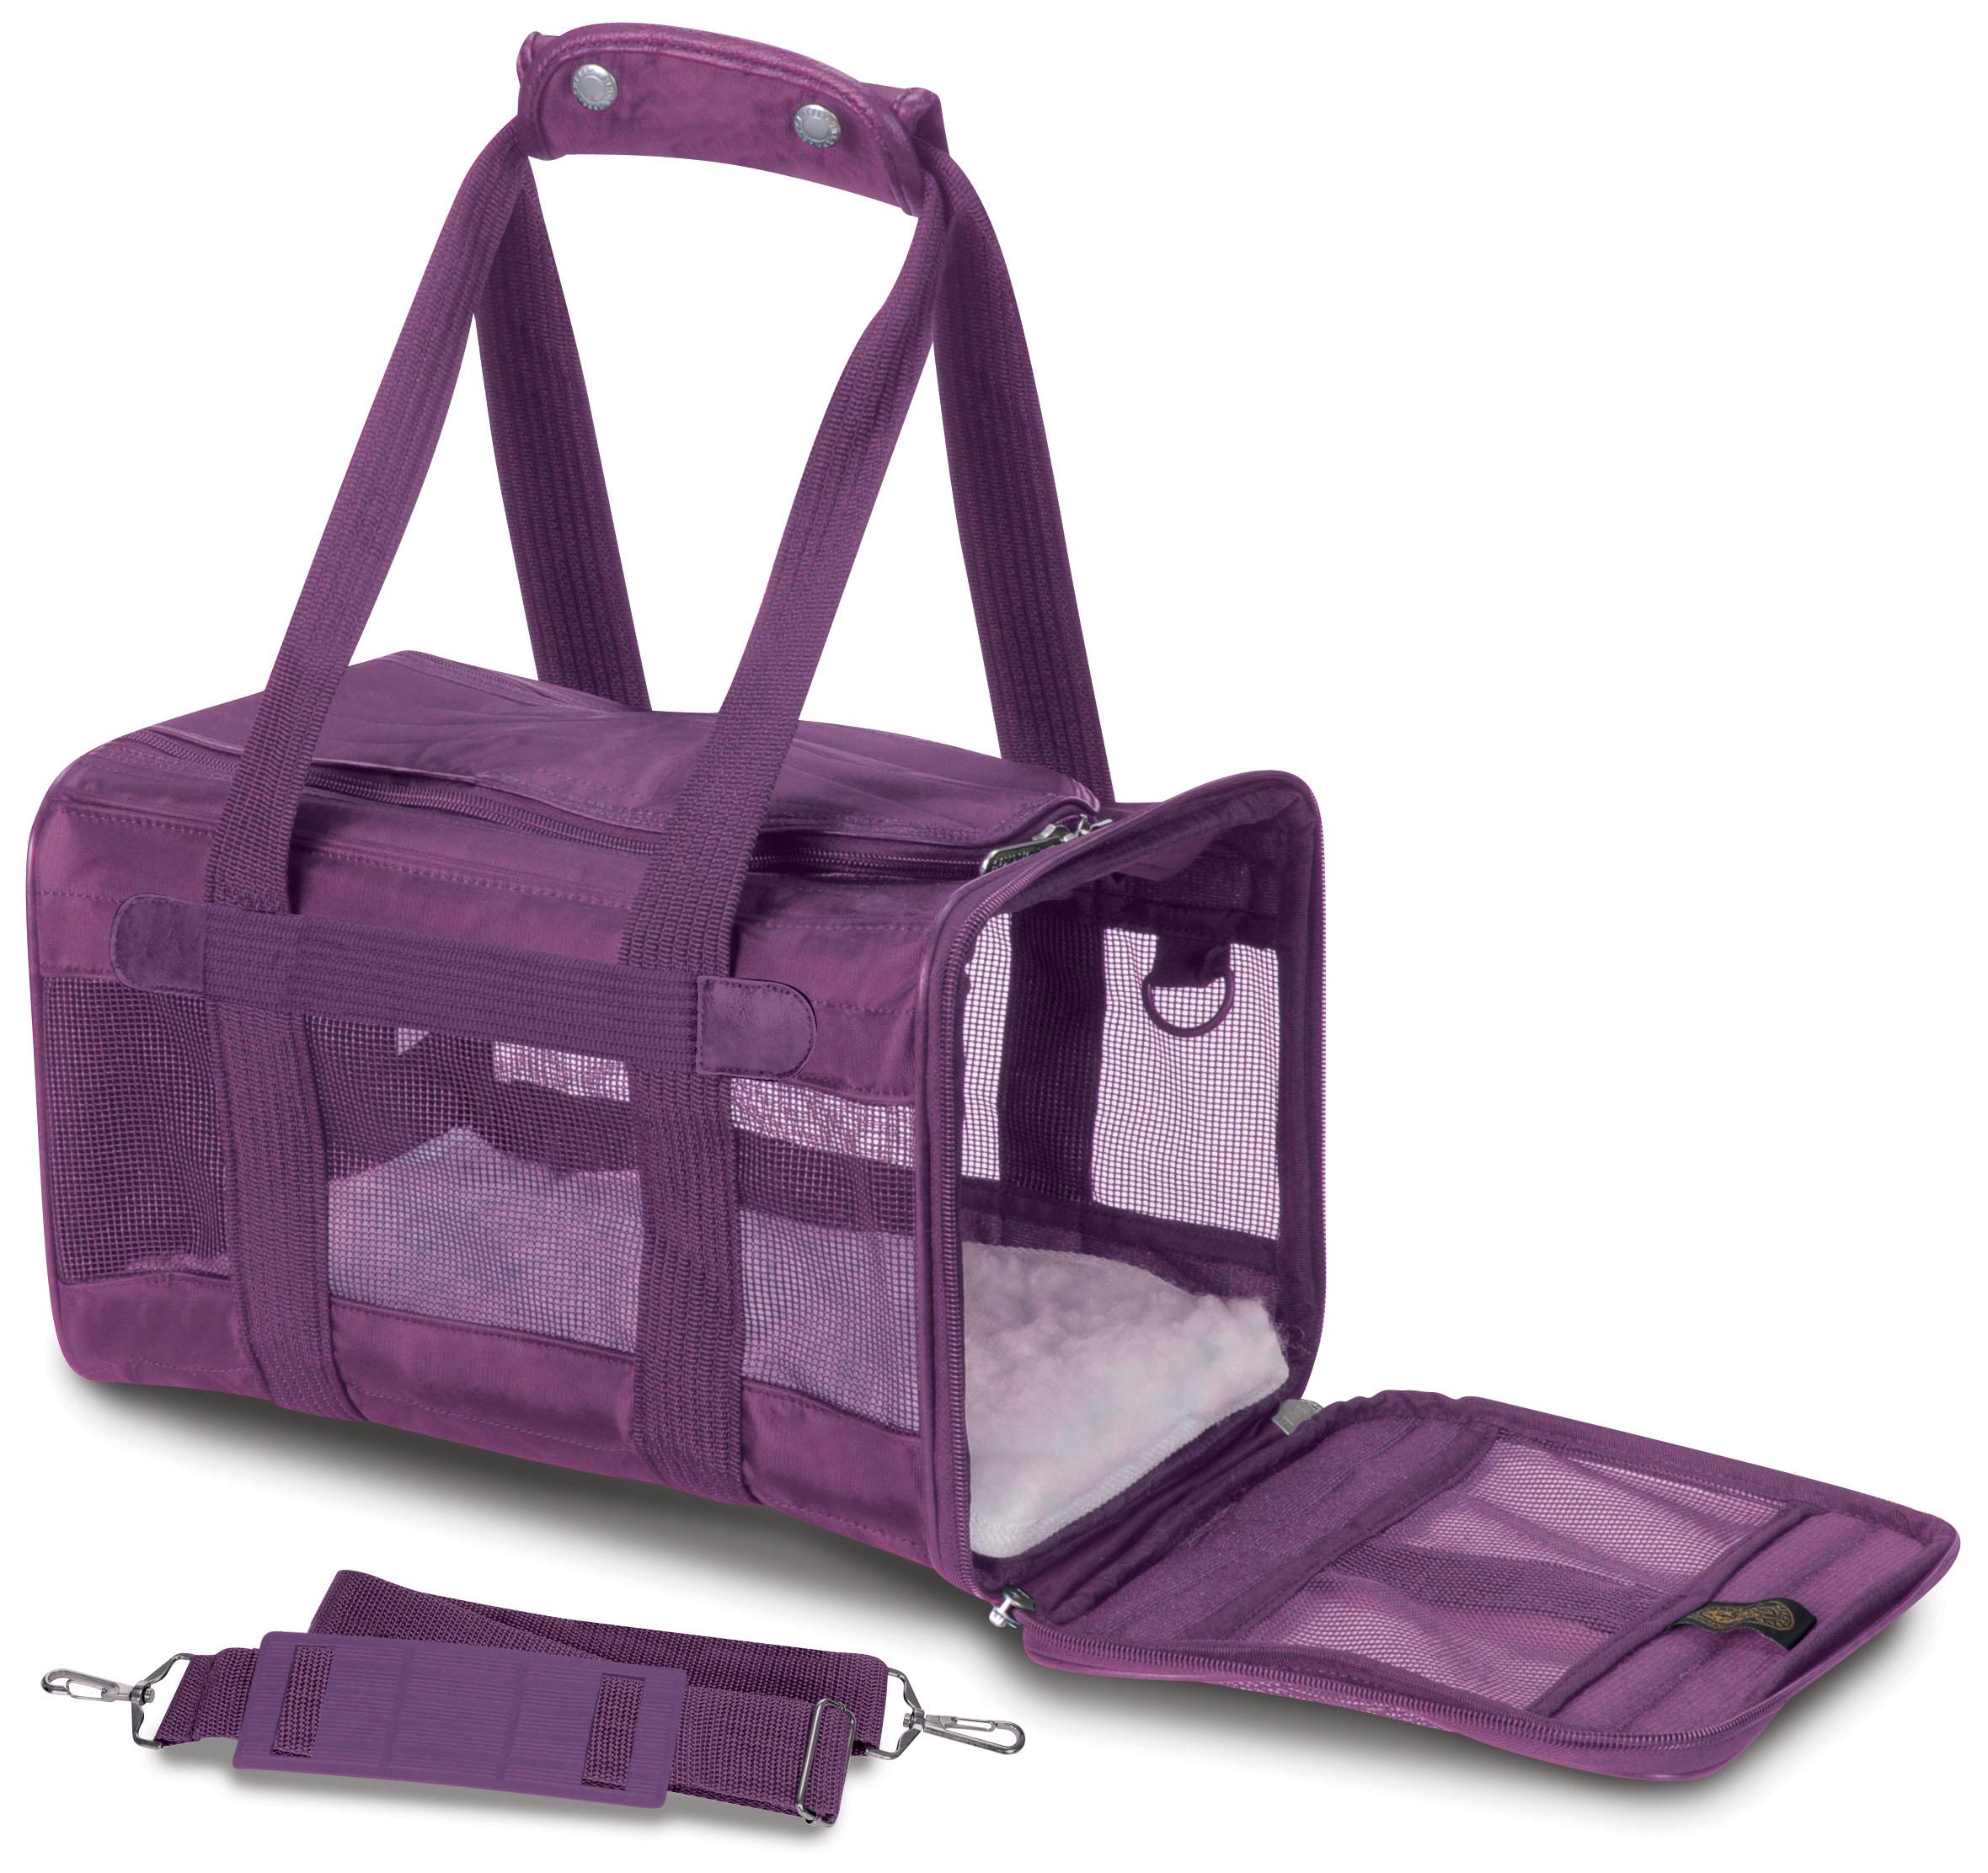 Sherpa® Original Deluxe™ Pet Carrier, Medium, Plum